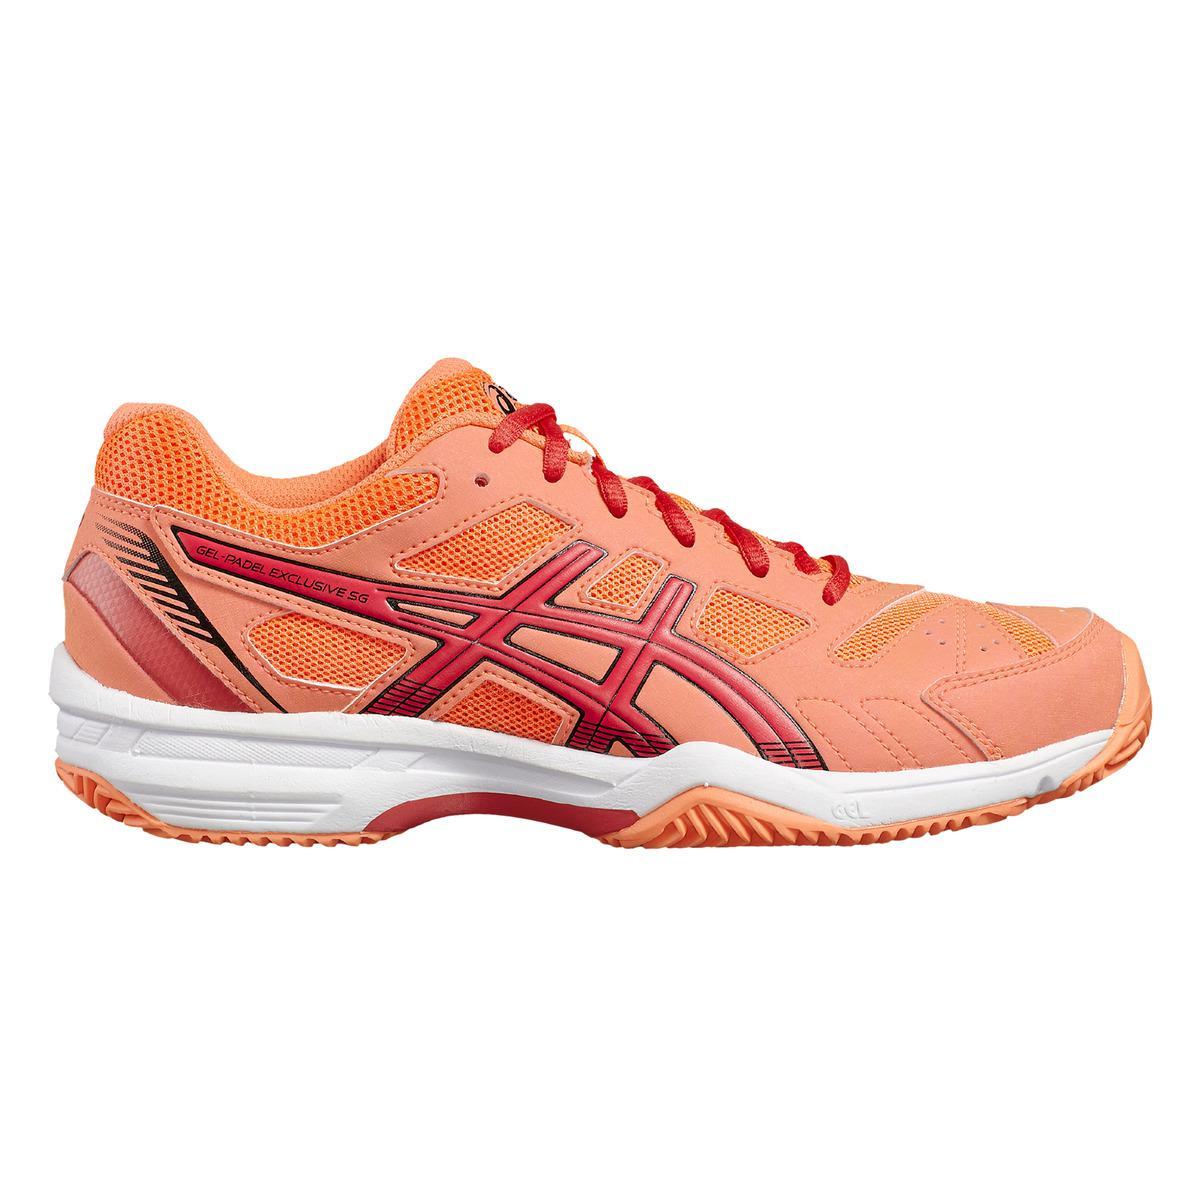 ee36d6d6885e Asics - Multicolor Gel-padel Exclusive 4 Sg Paddle Tennis Shoes - Lyst.  View fullscreen